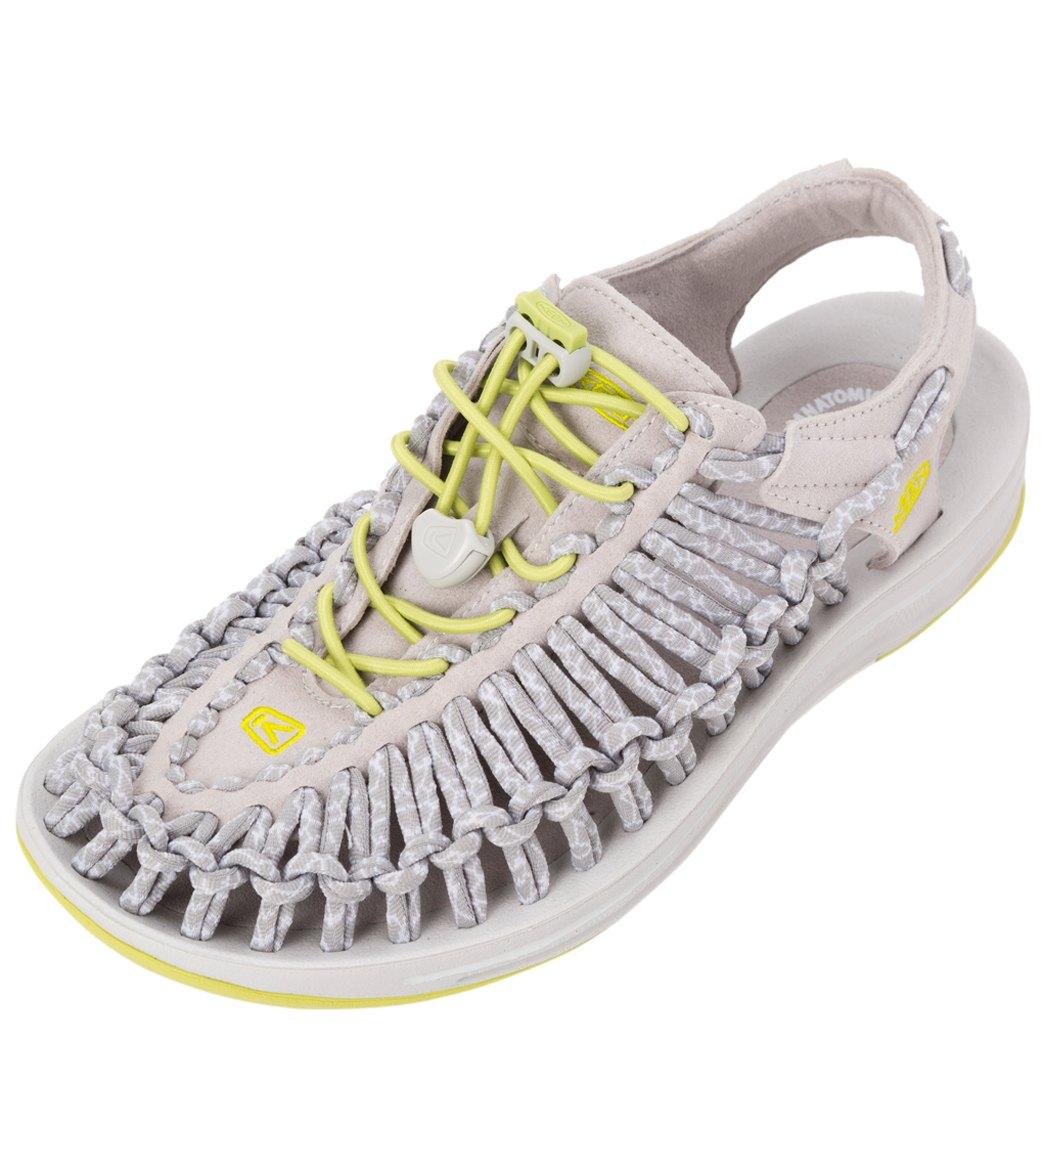 3797771fbaa2 Keen Women s Uneek 8mm Rock Water Shoes at SwimOutlet.com ...